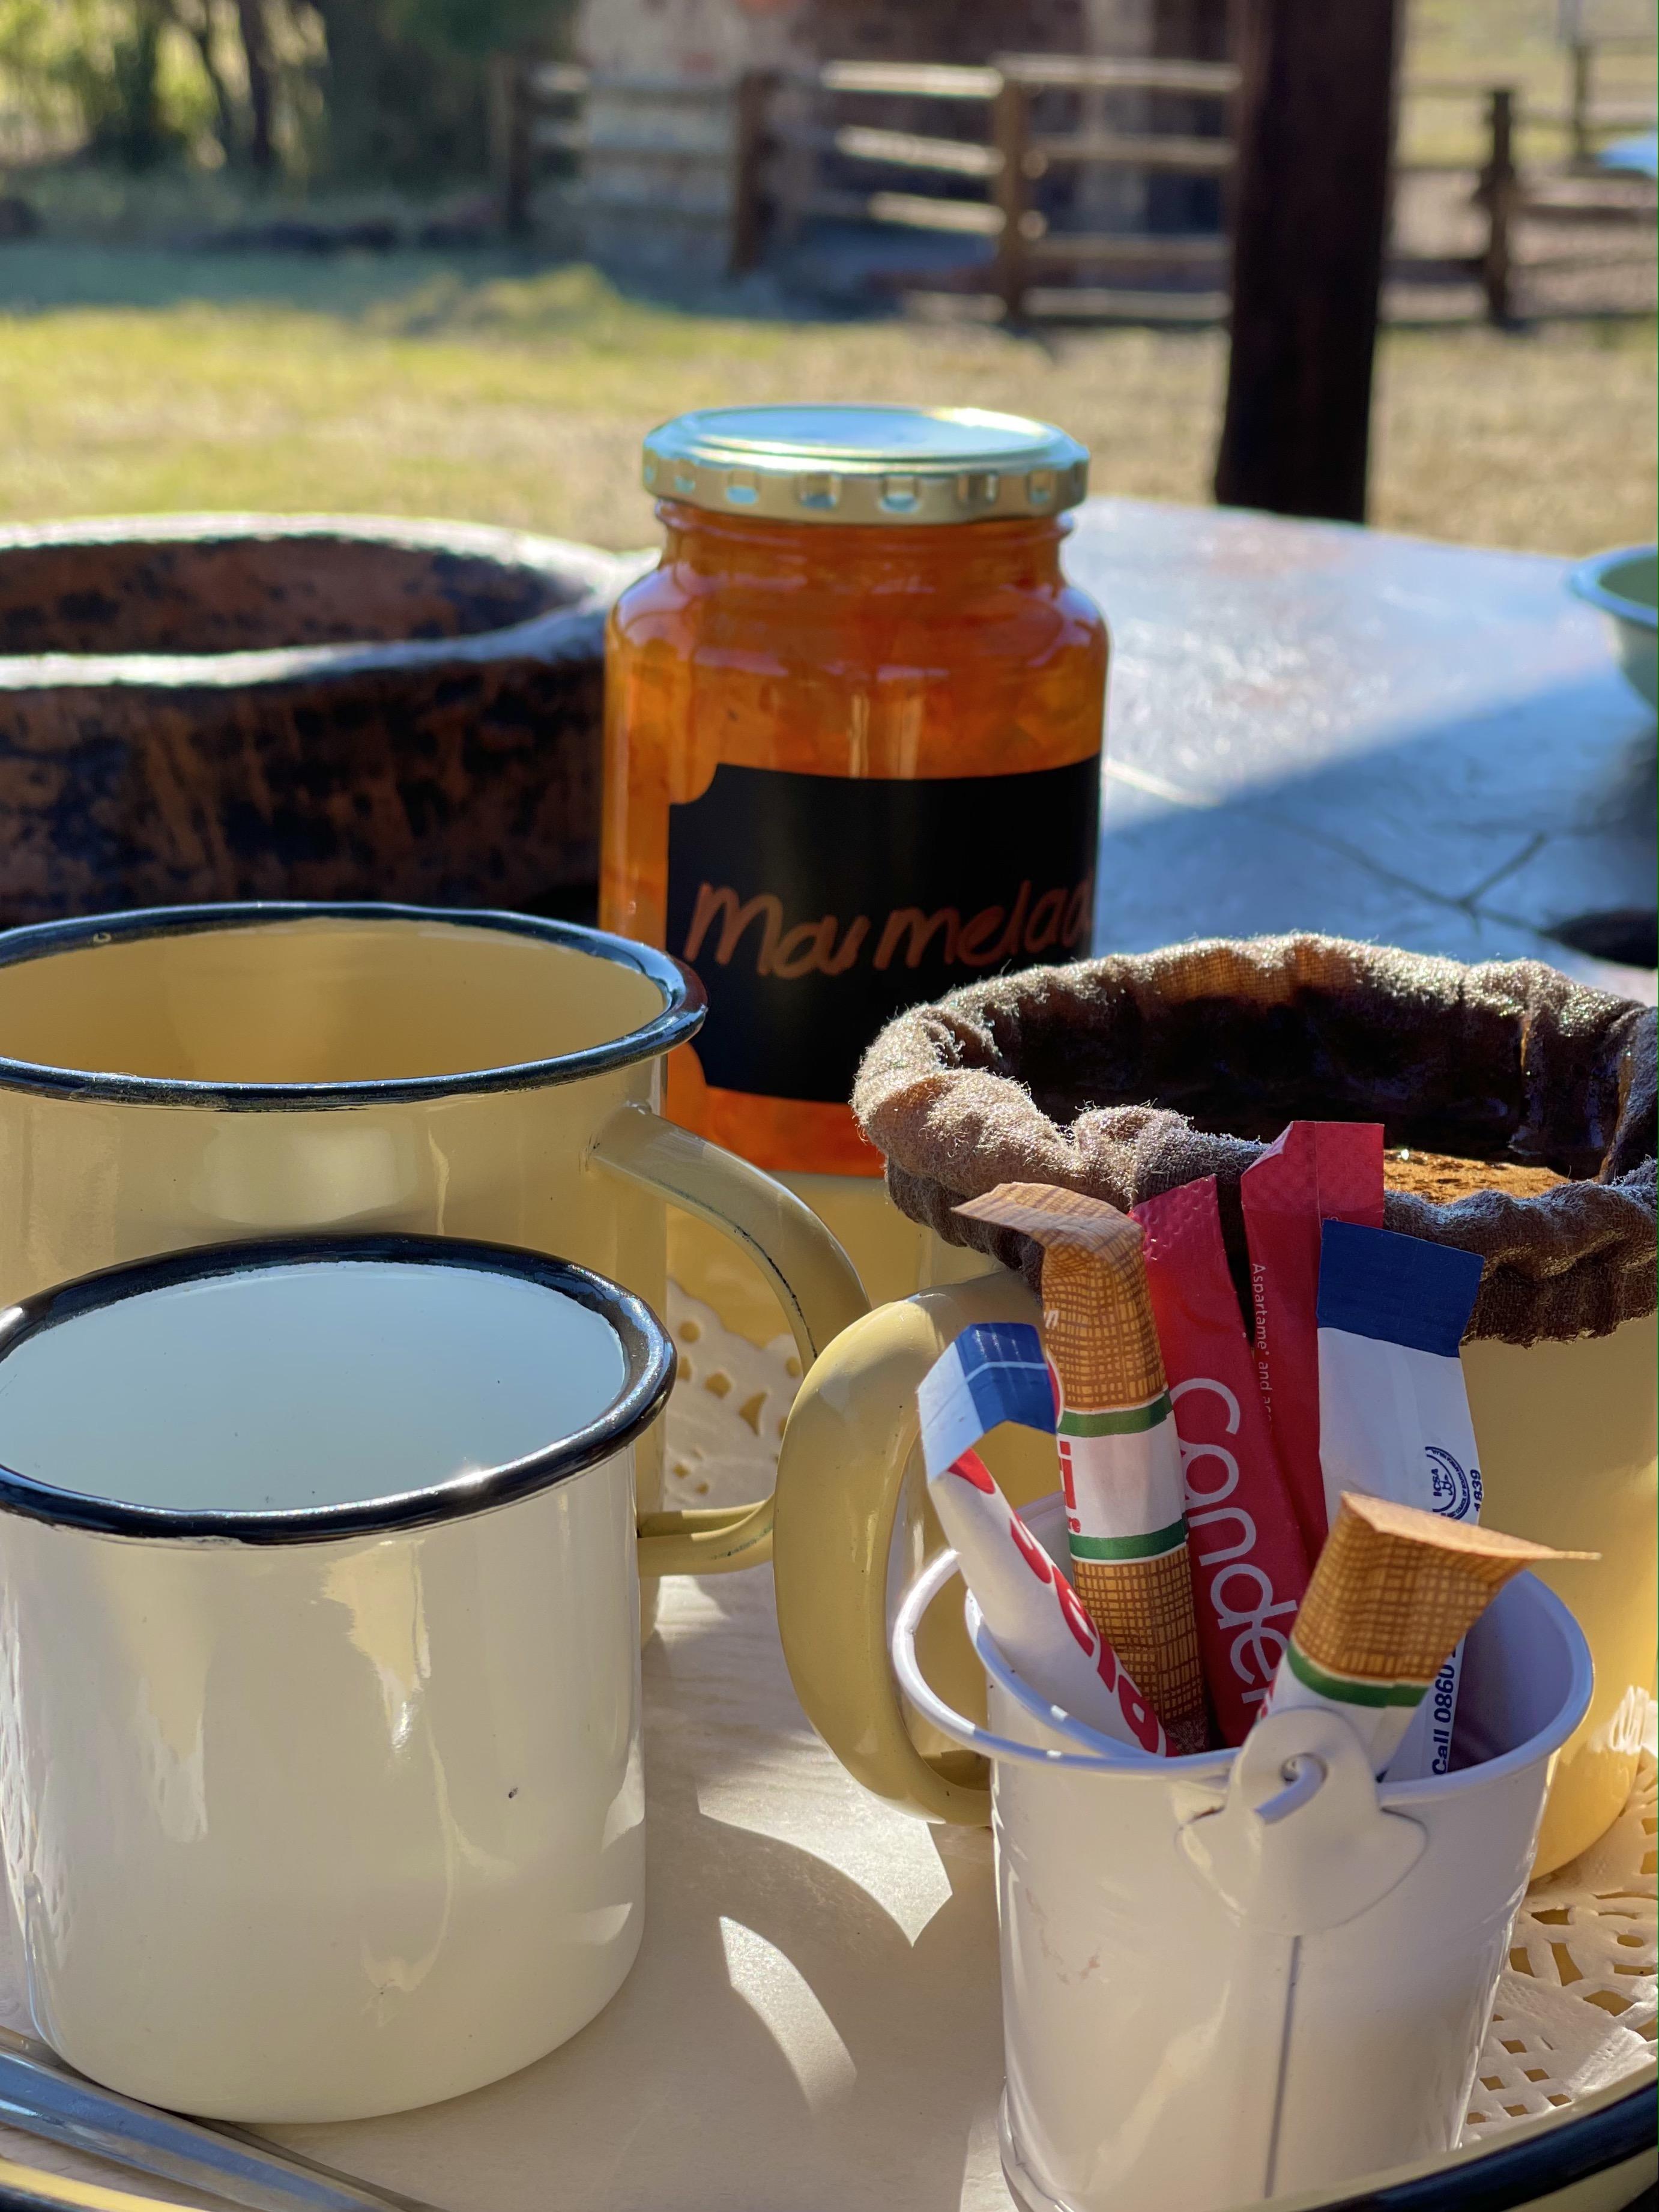 Moer koffie and condense milk